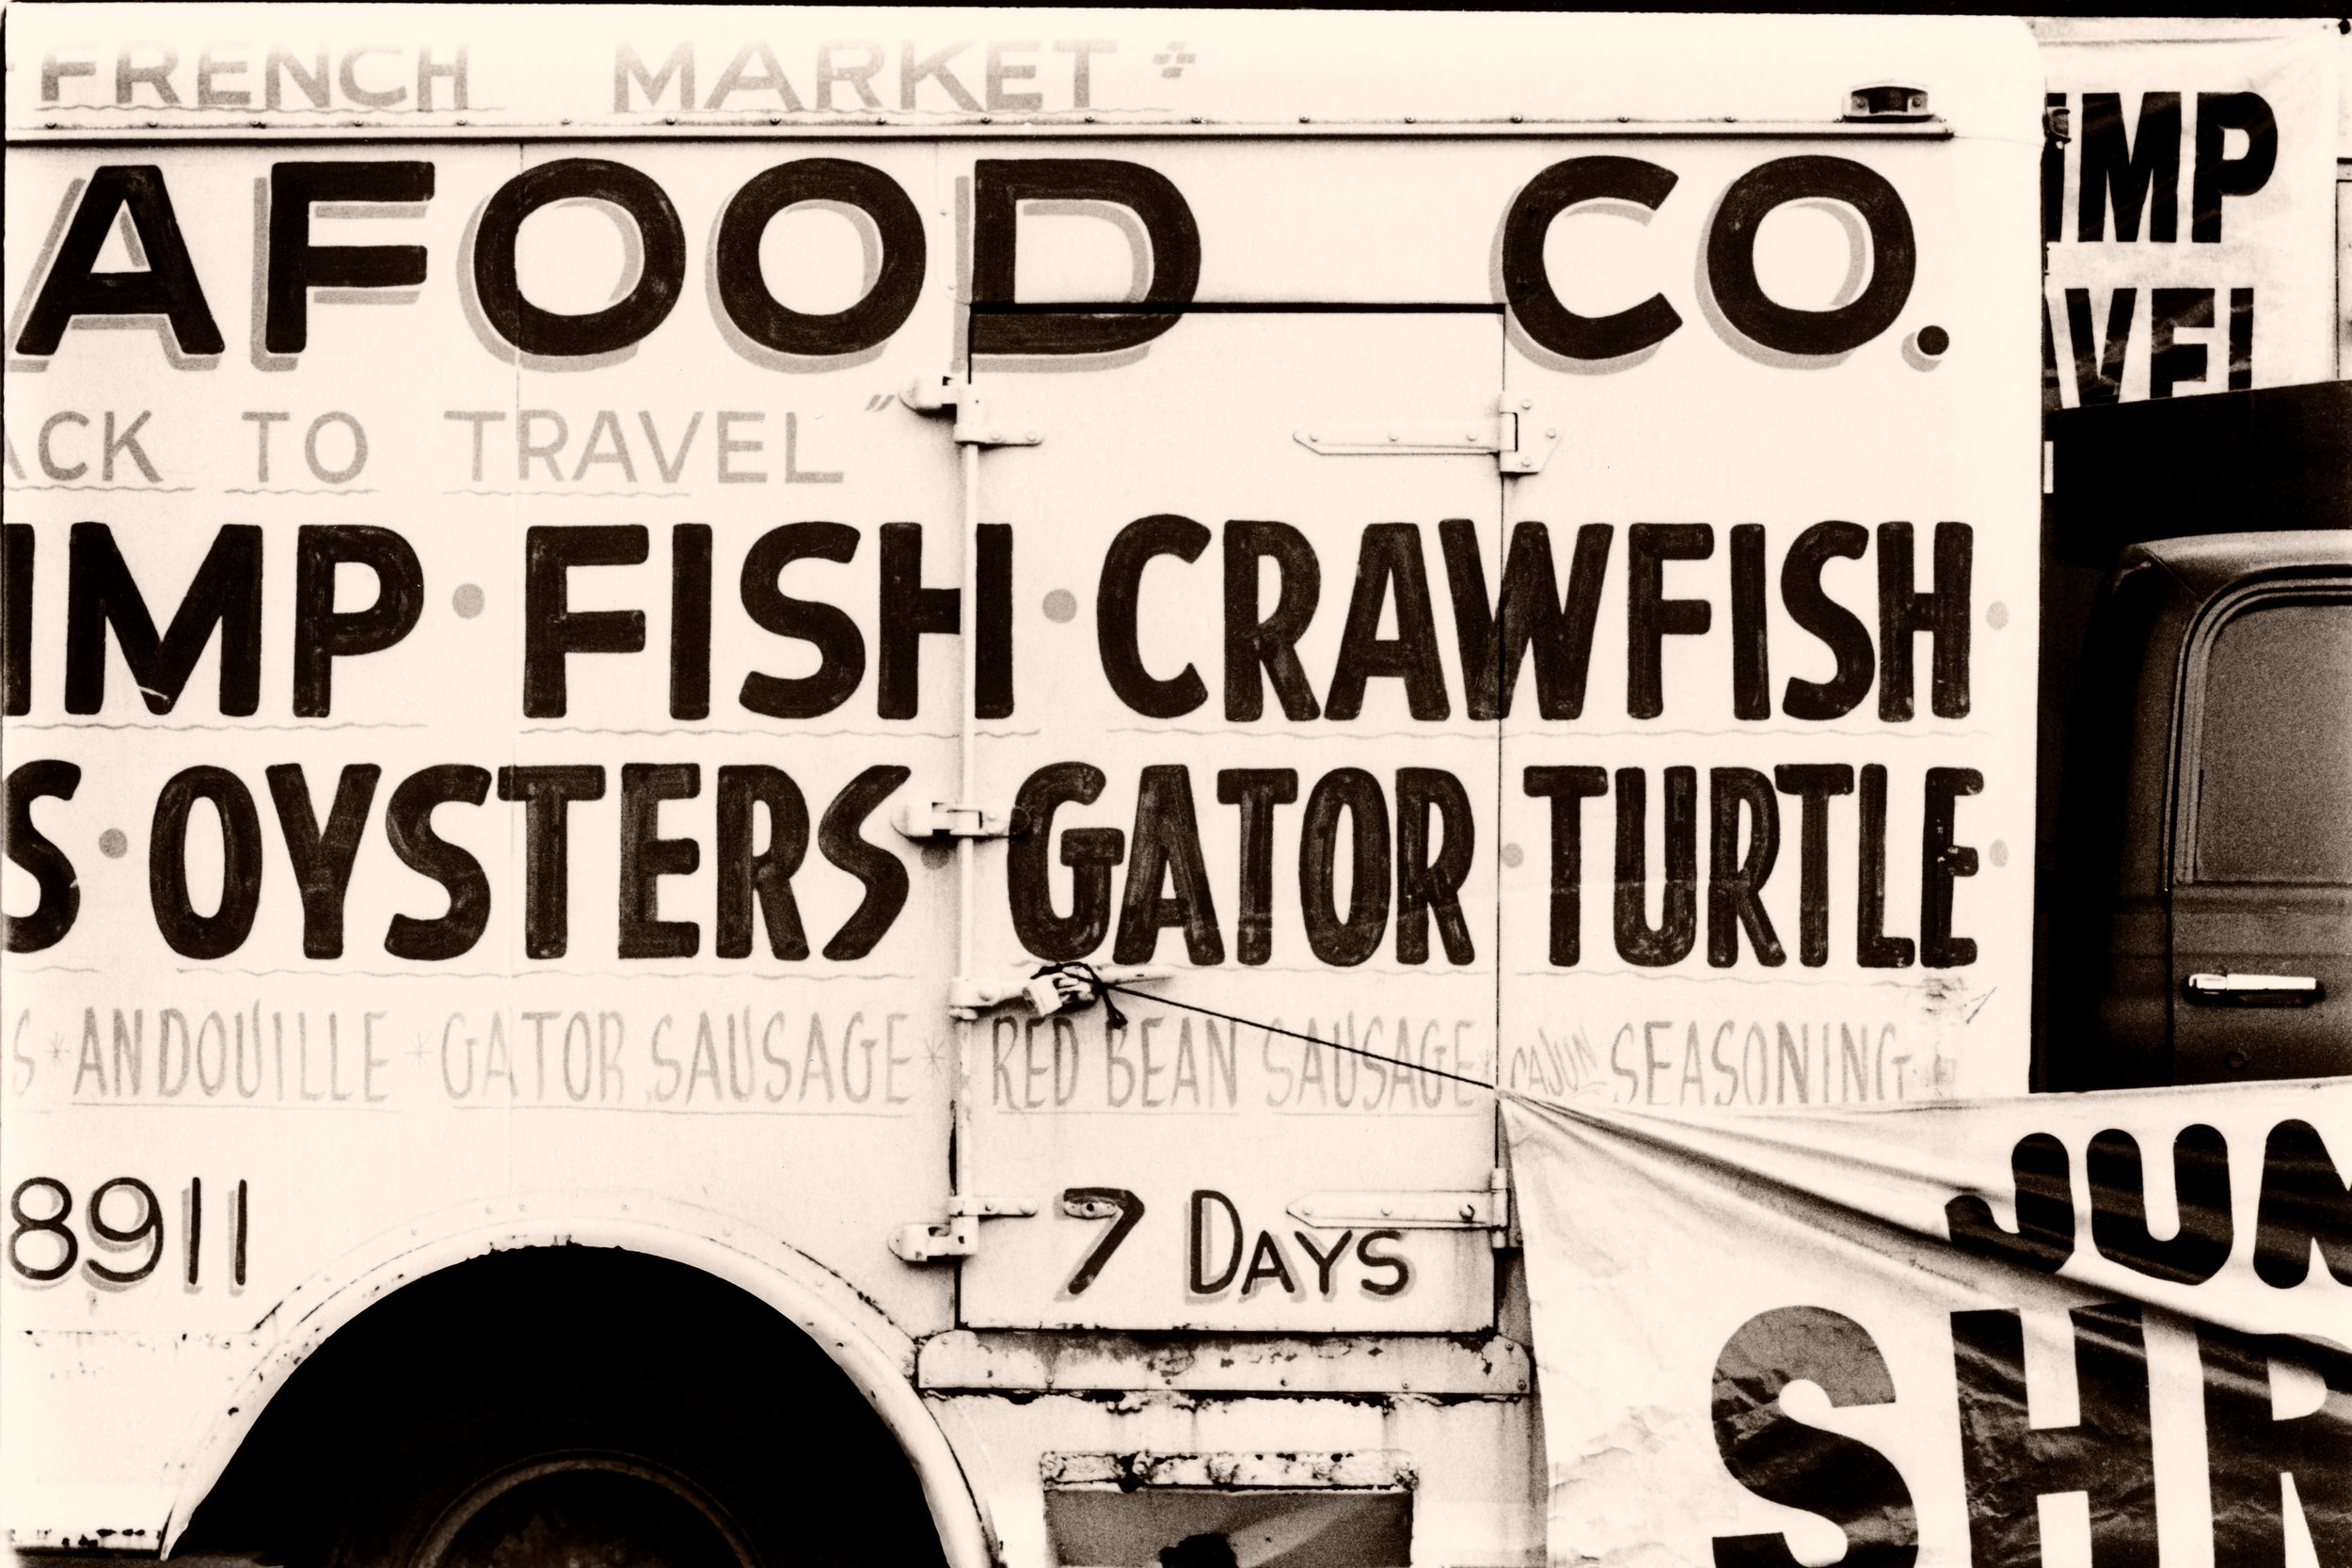 seafood truck.jpg